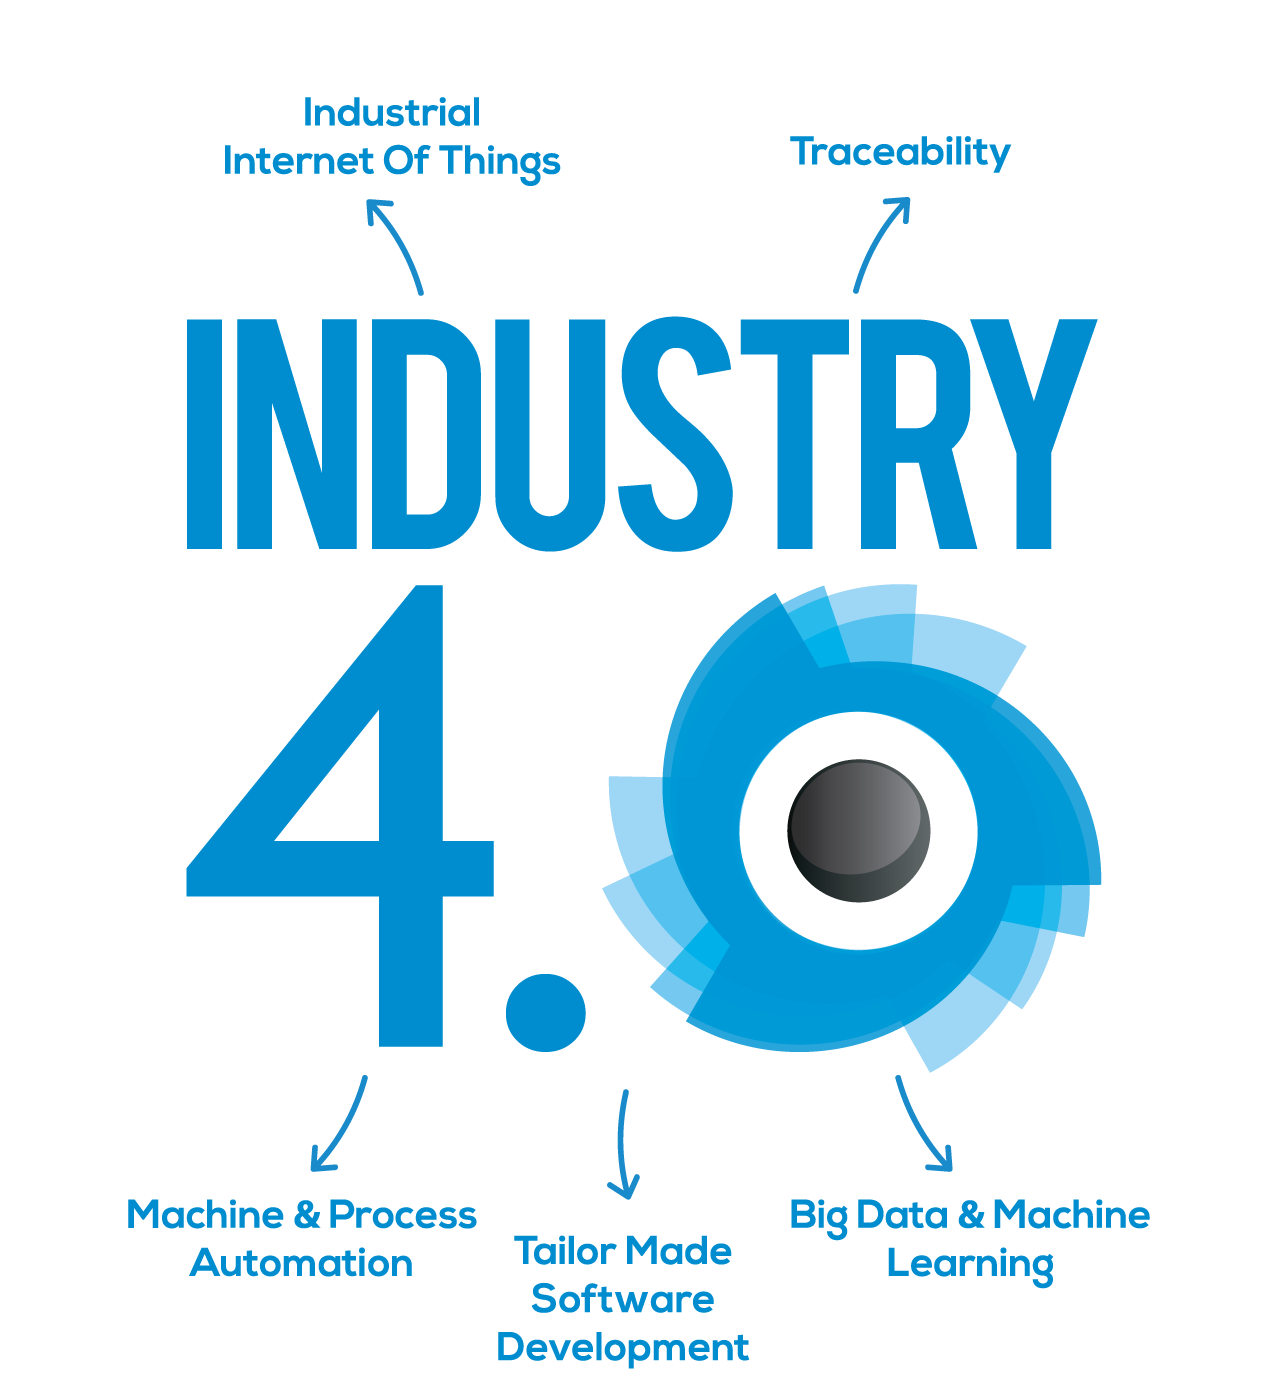 Industry40, Industry4.0, industry40, IOT, iiot, Machine_Learning, Siskon , Siskon_Otomasyon, Siskon_Yazilim